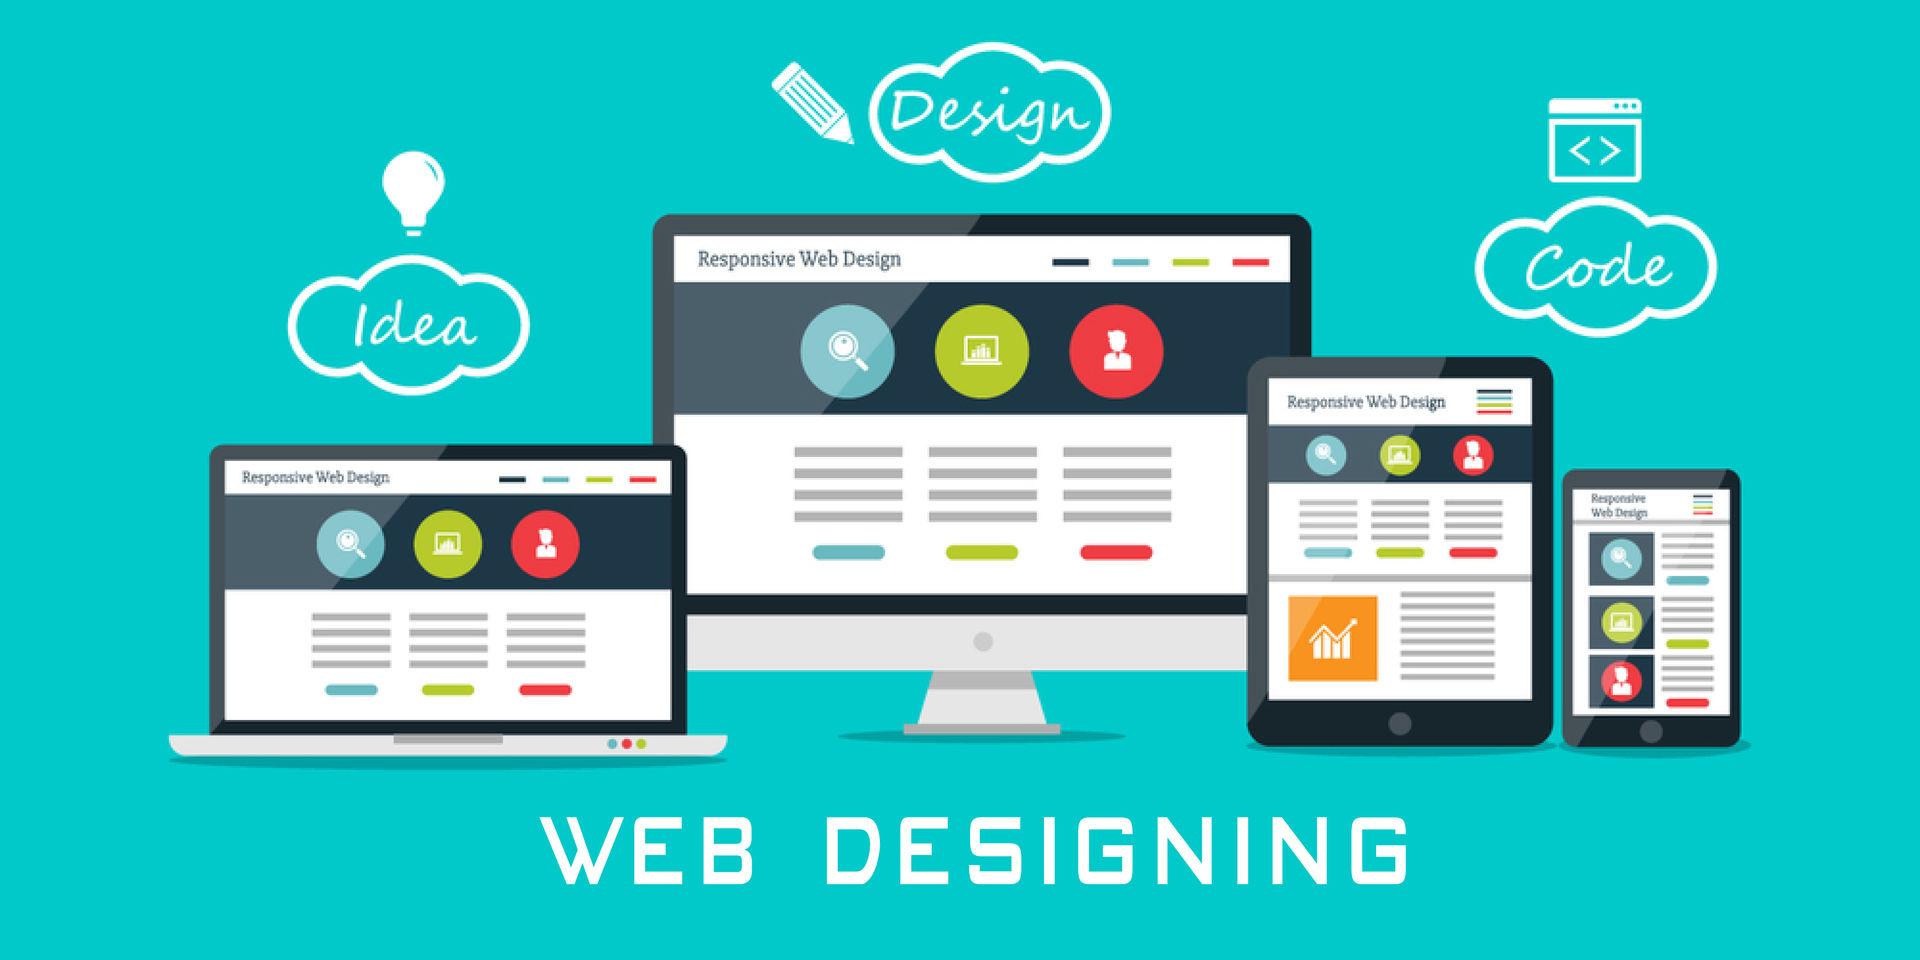 Web Designing Course in Guntur - Best Web Design Training at Nipuna